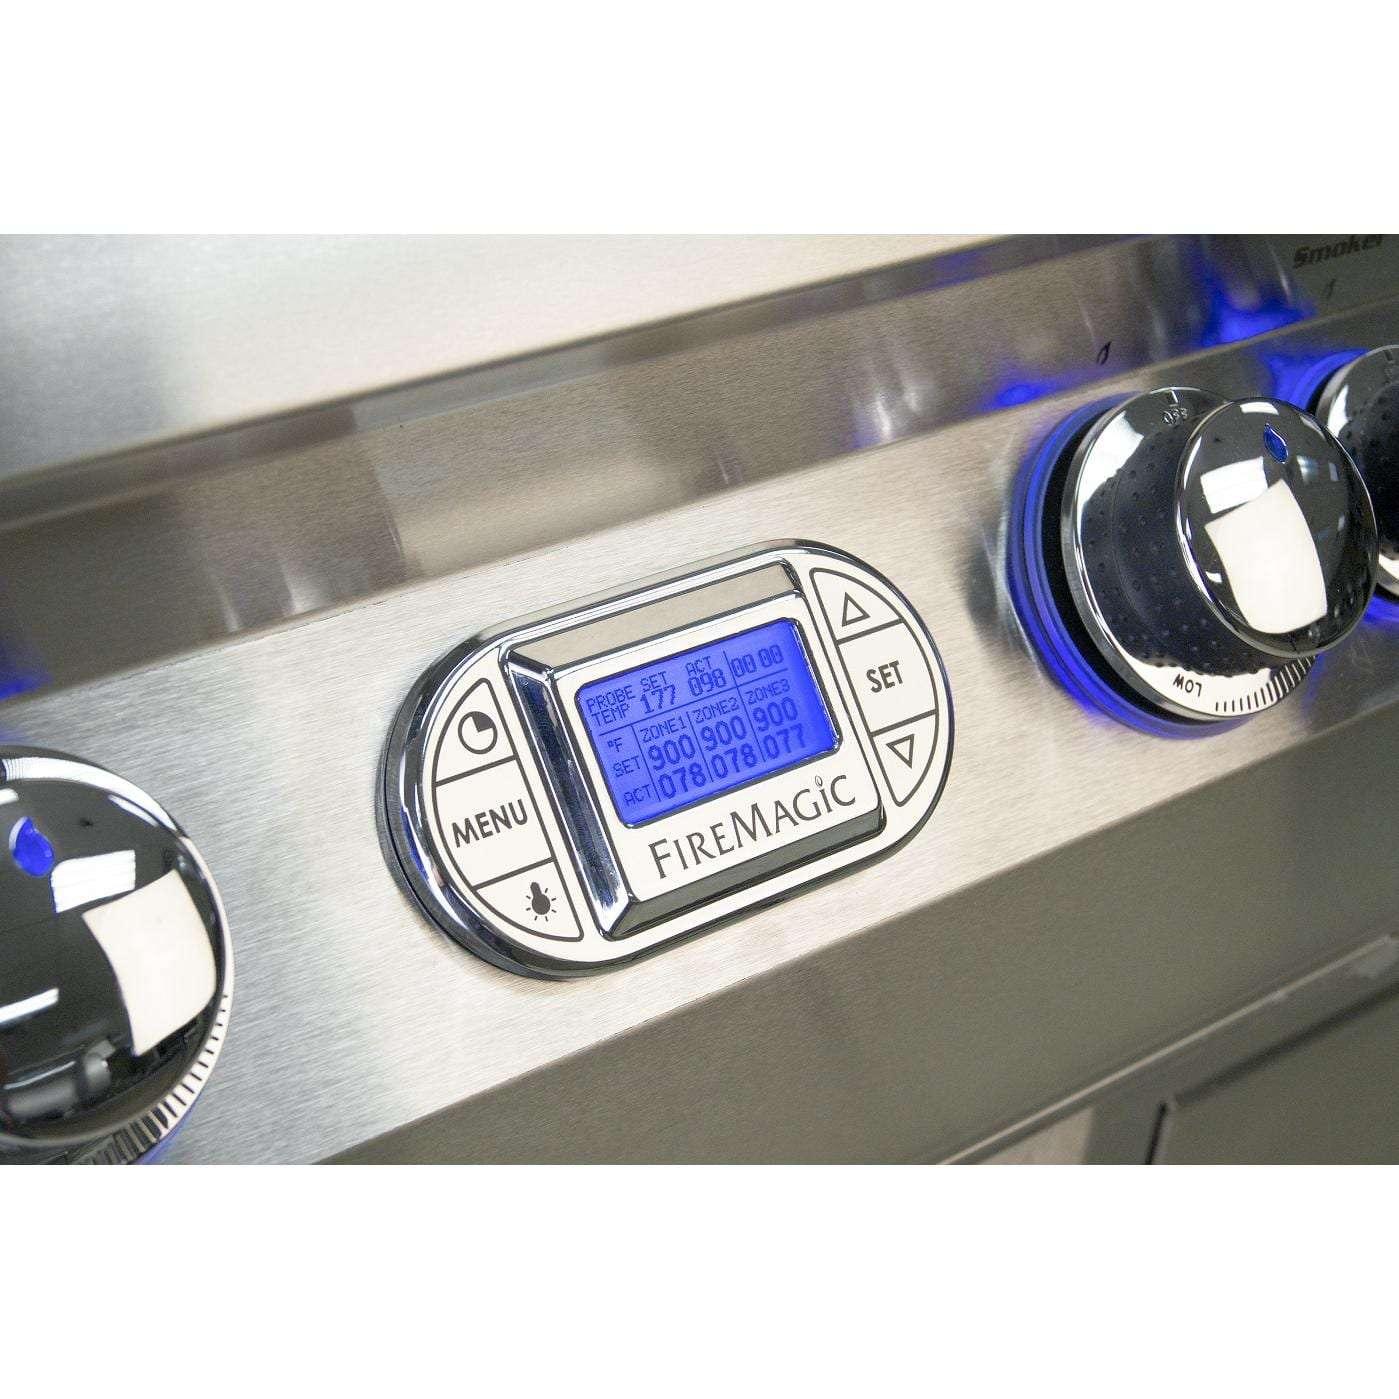 Fire Magic Echelon Diamond E660i Natural Gas Grill on Cart - Chrome Digital Thermometer